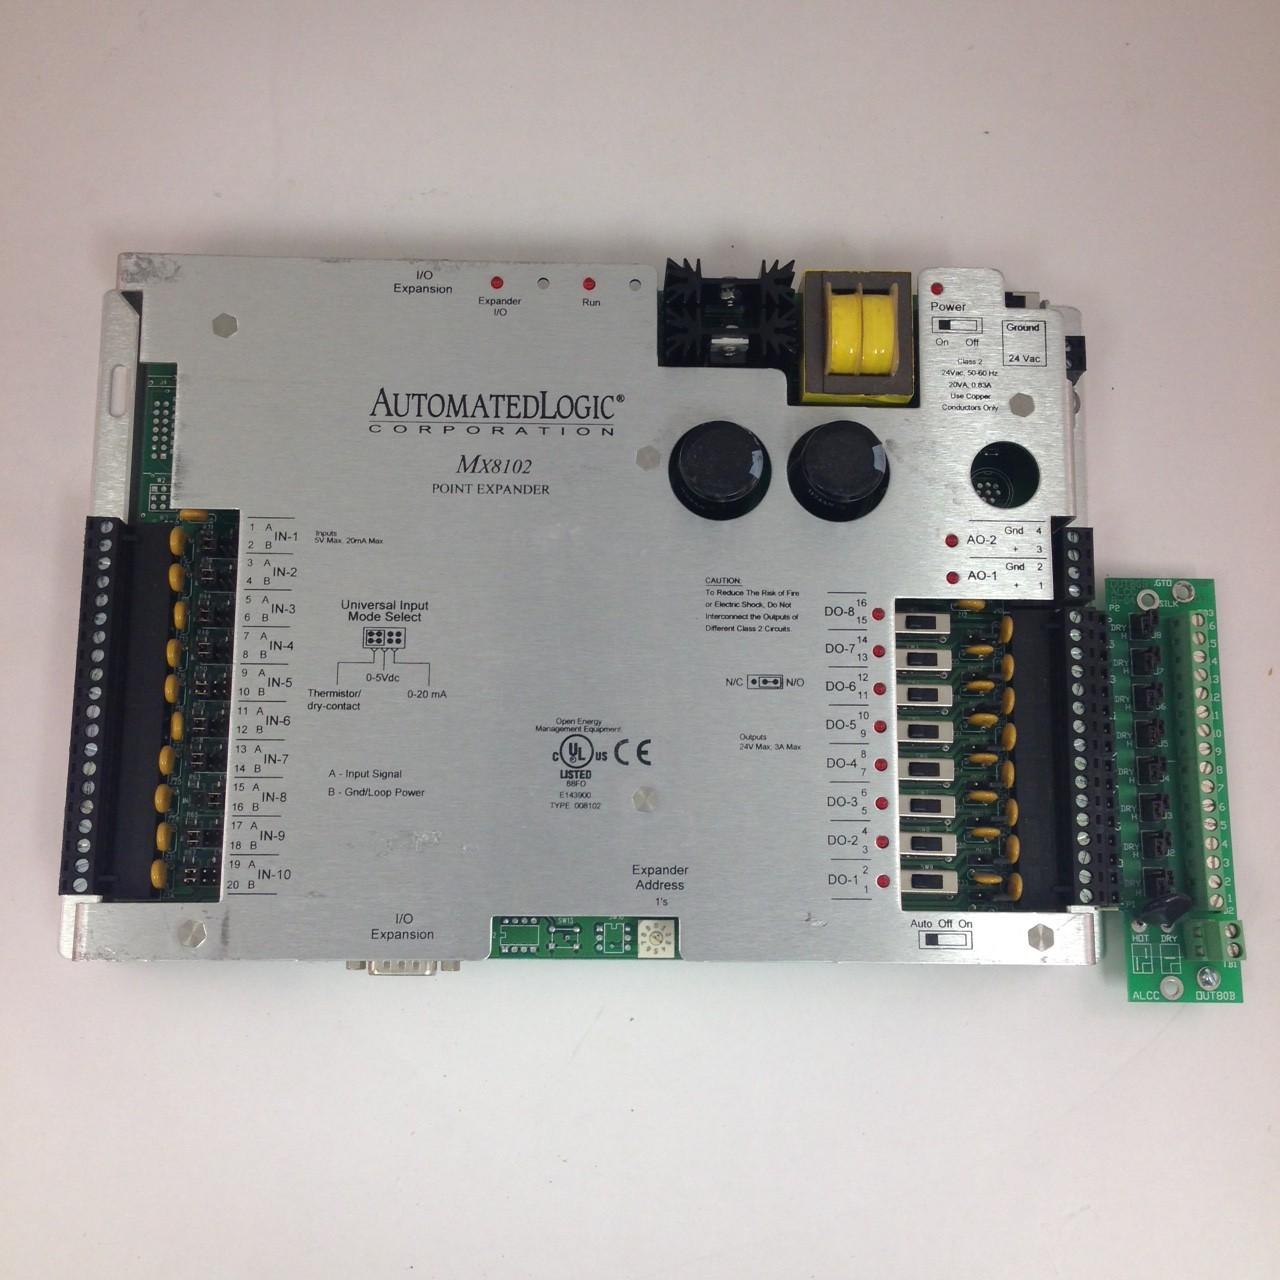 Automated Logic # MX8102 Point Expander Used